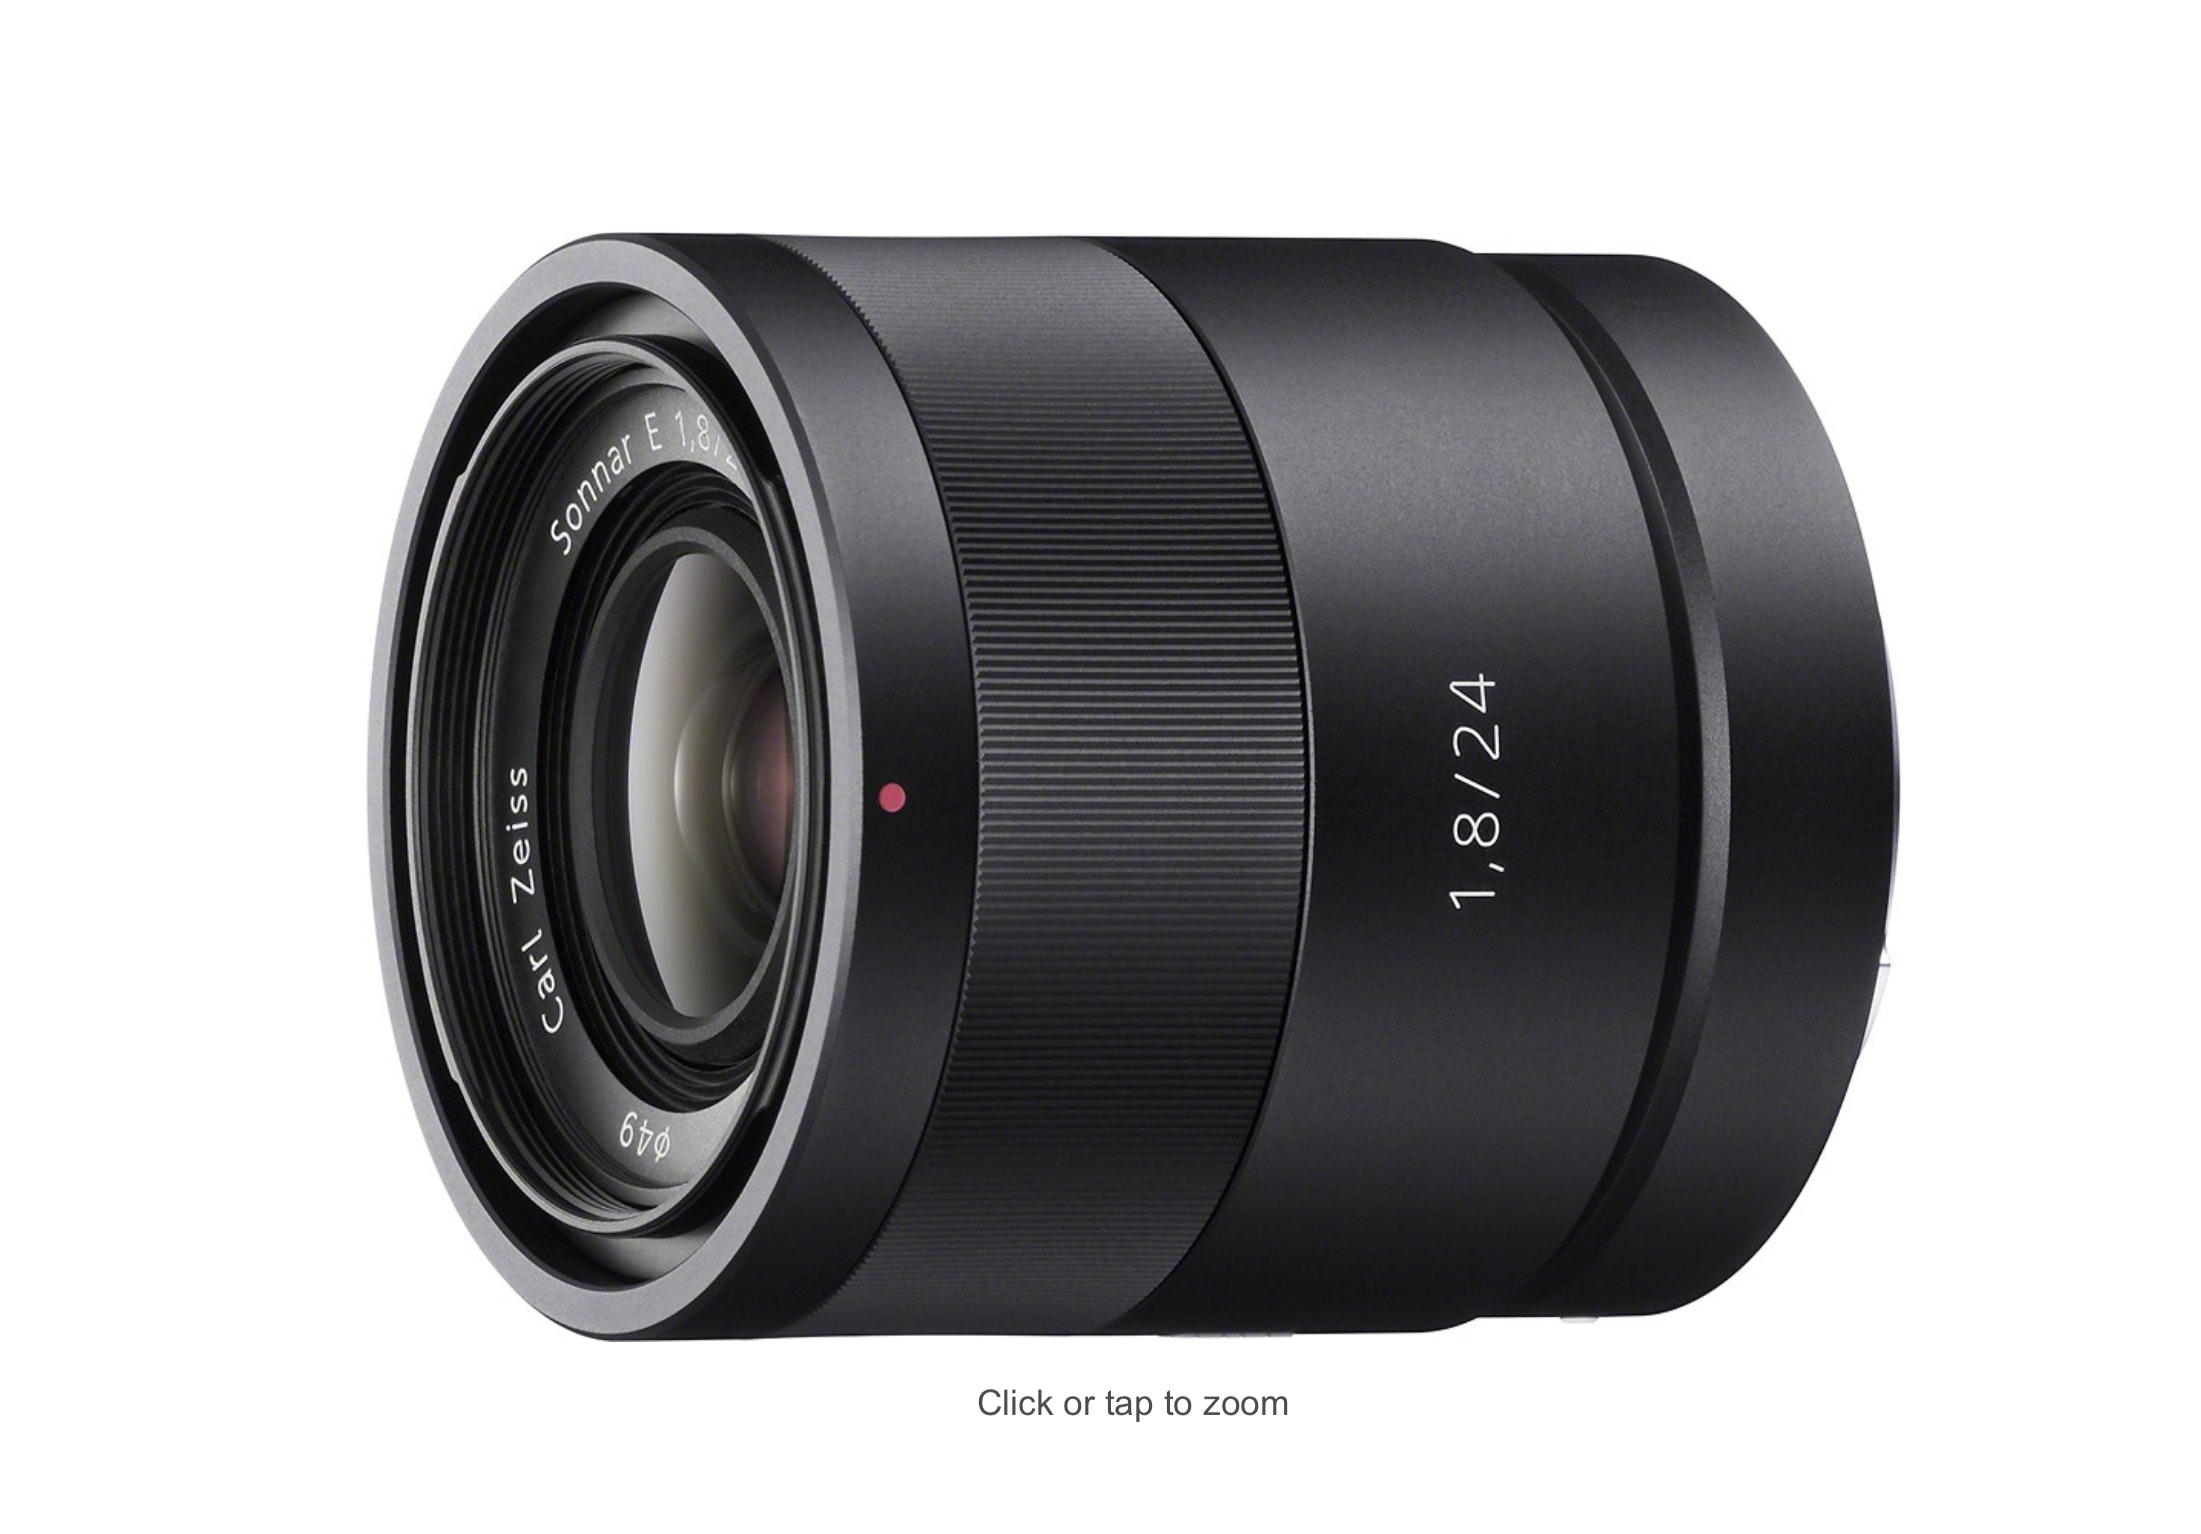 Carl Zeiss Sonnar T* E 24mm f/1.8 ZA Prime Lens